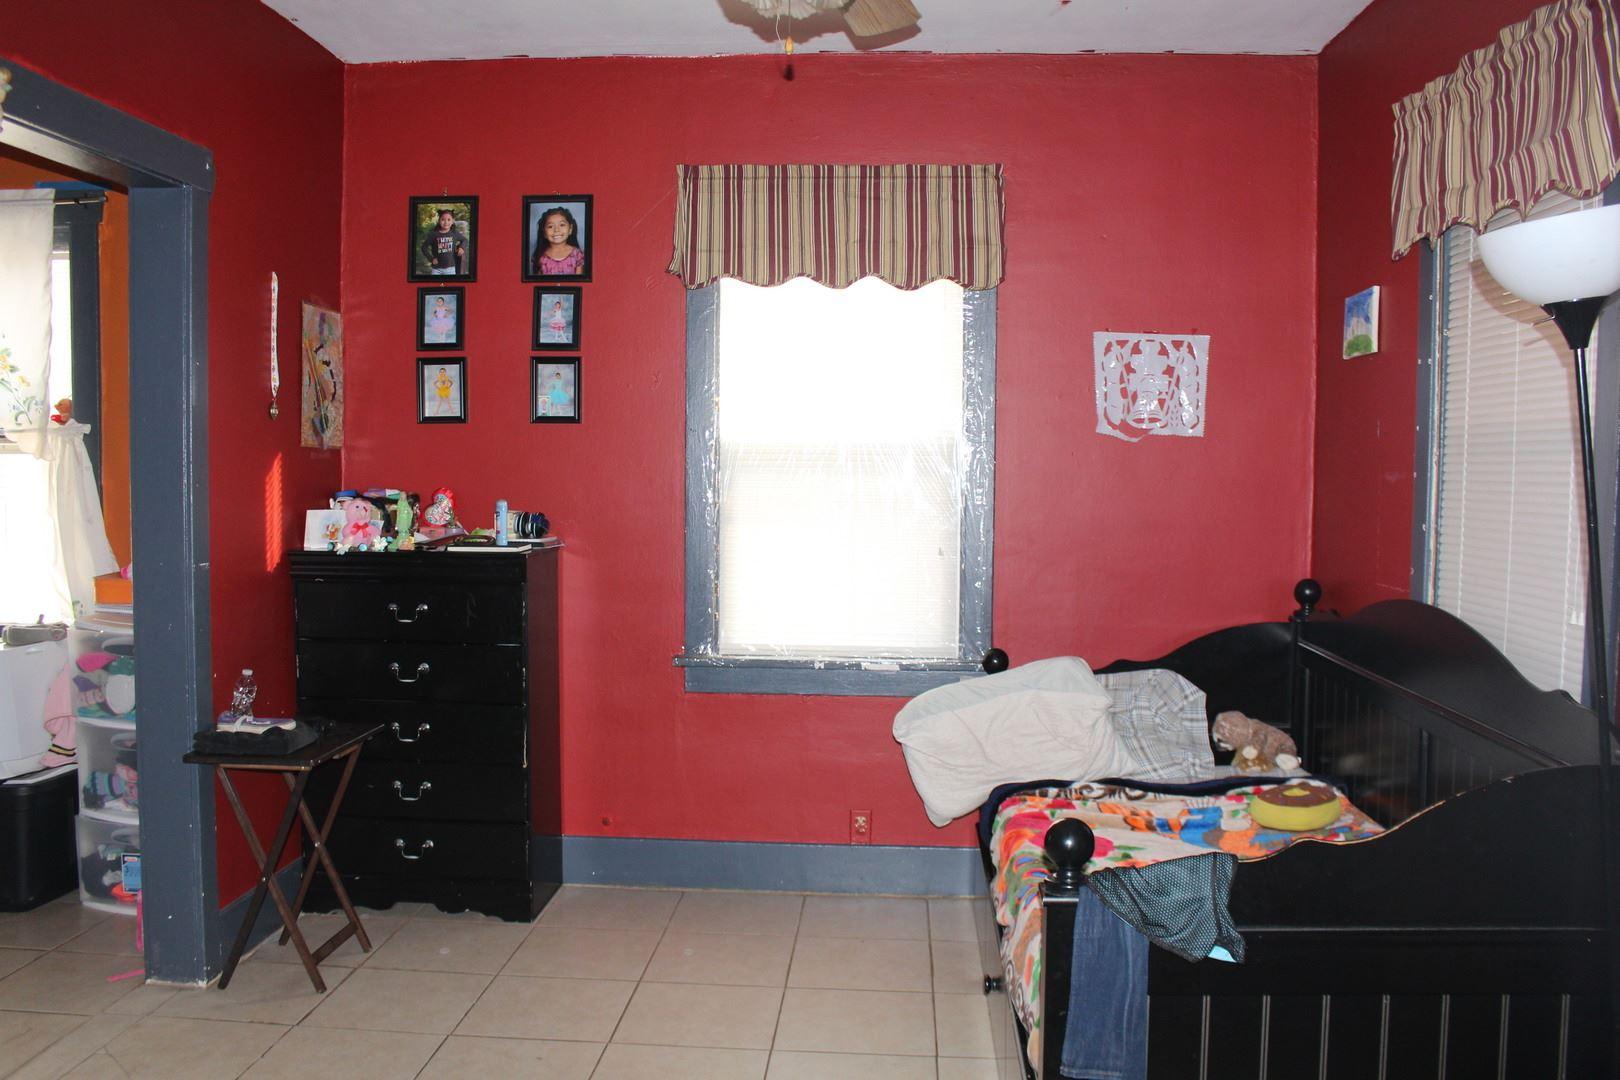 471 CLARK Street, Elgin, IL 60123 - #: 10651222